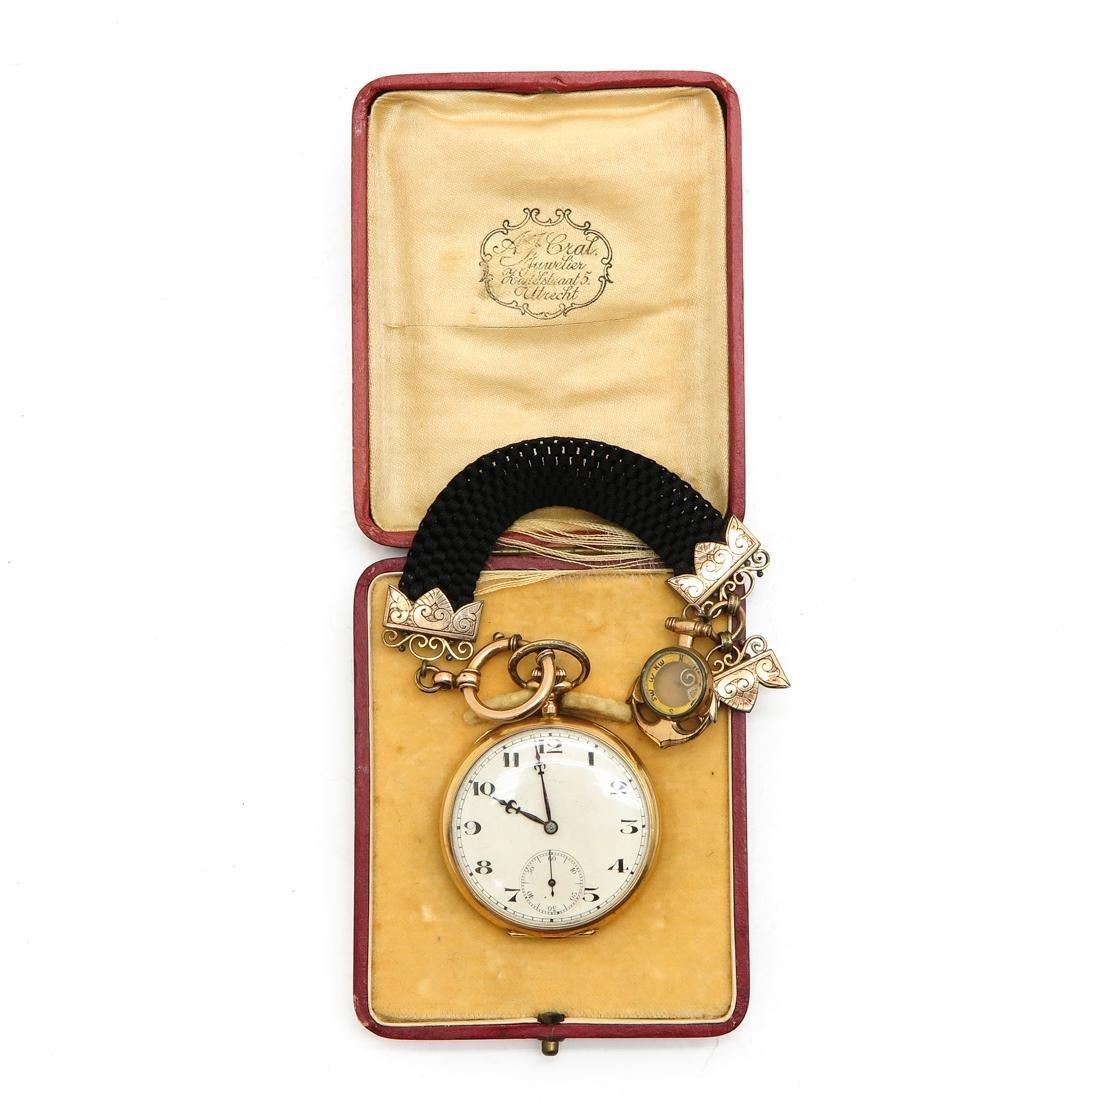 14KG Pocket Watch